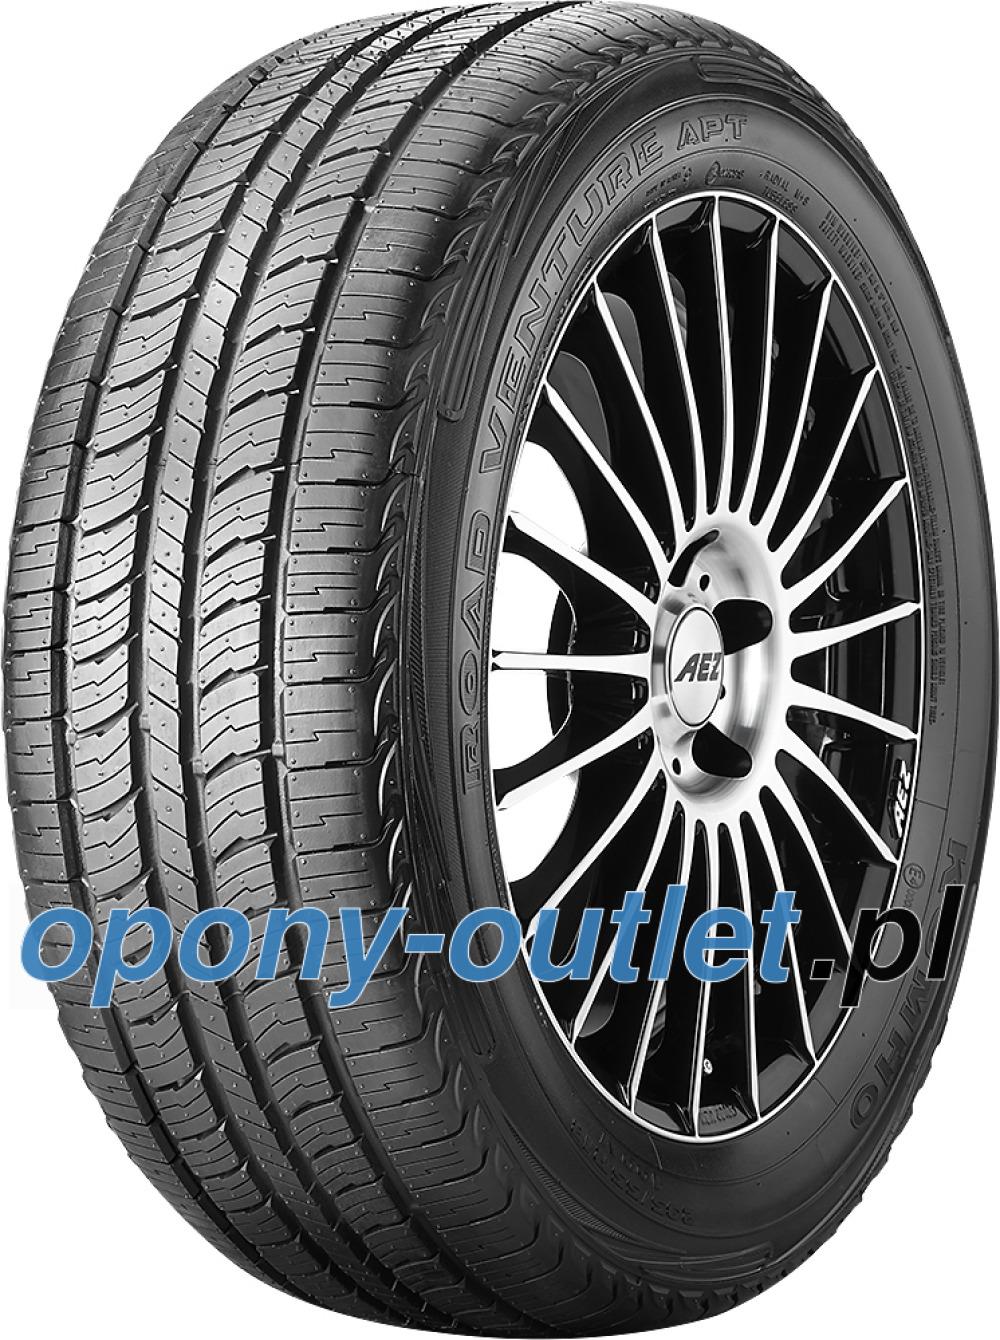 Kumho Road Venture APT KL51 ( P265/65 R17 112H )